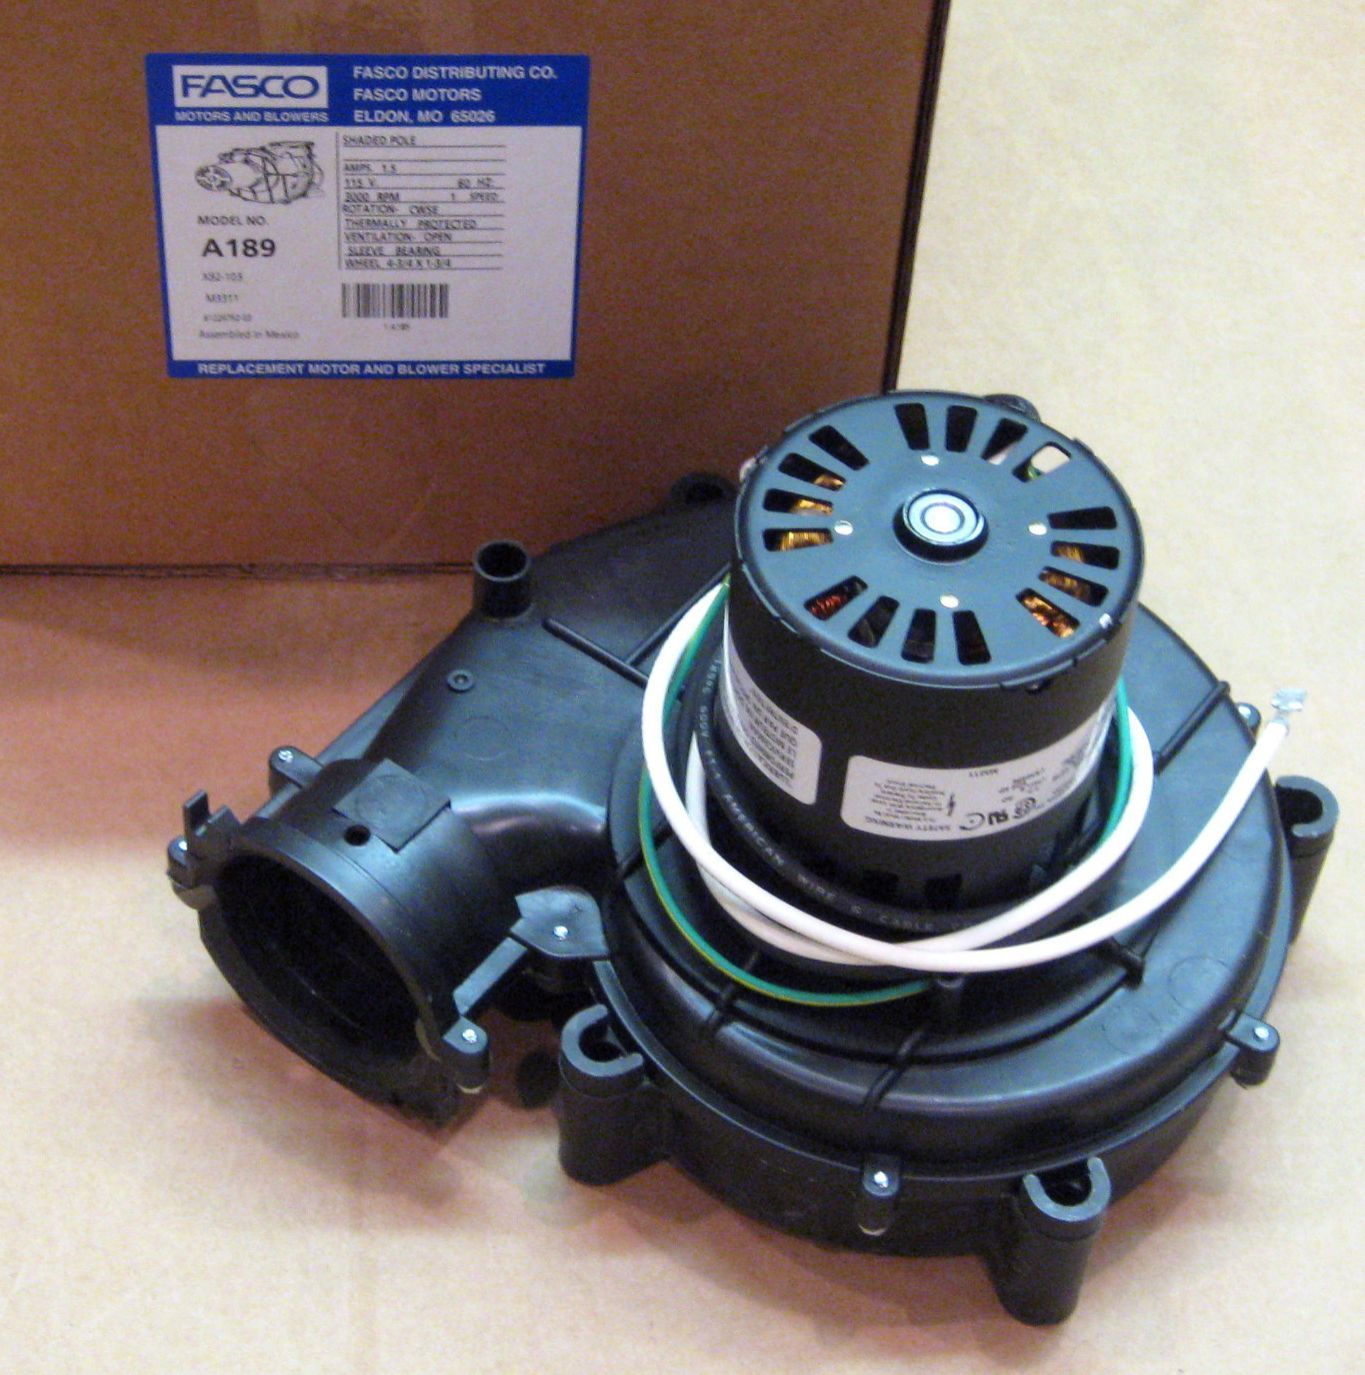 A189 Fasco Inducer Furnace Blower Motor For Goodman 7021